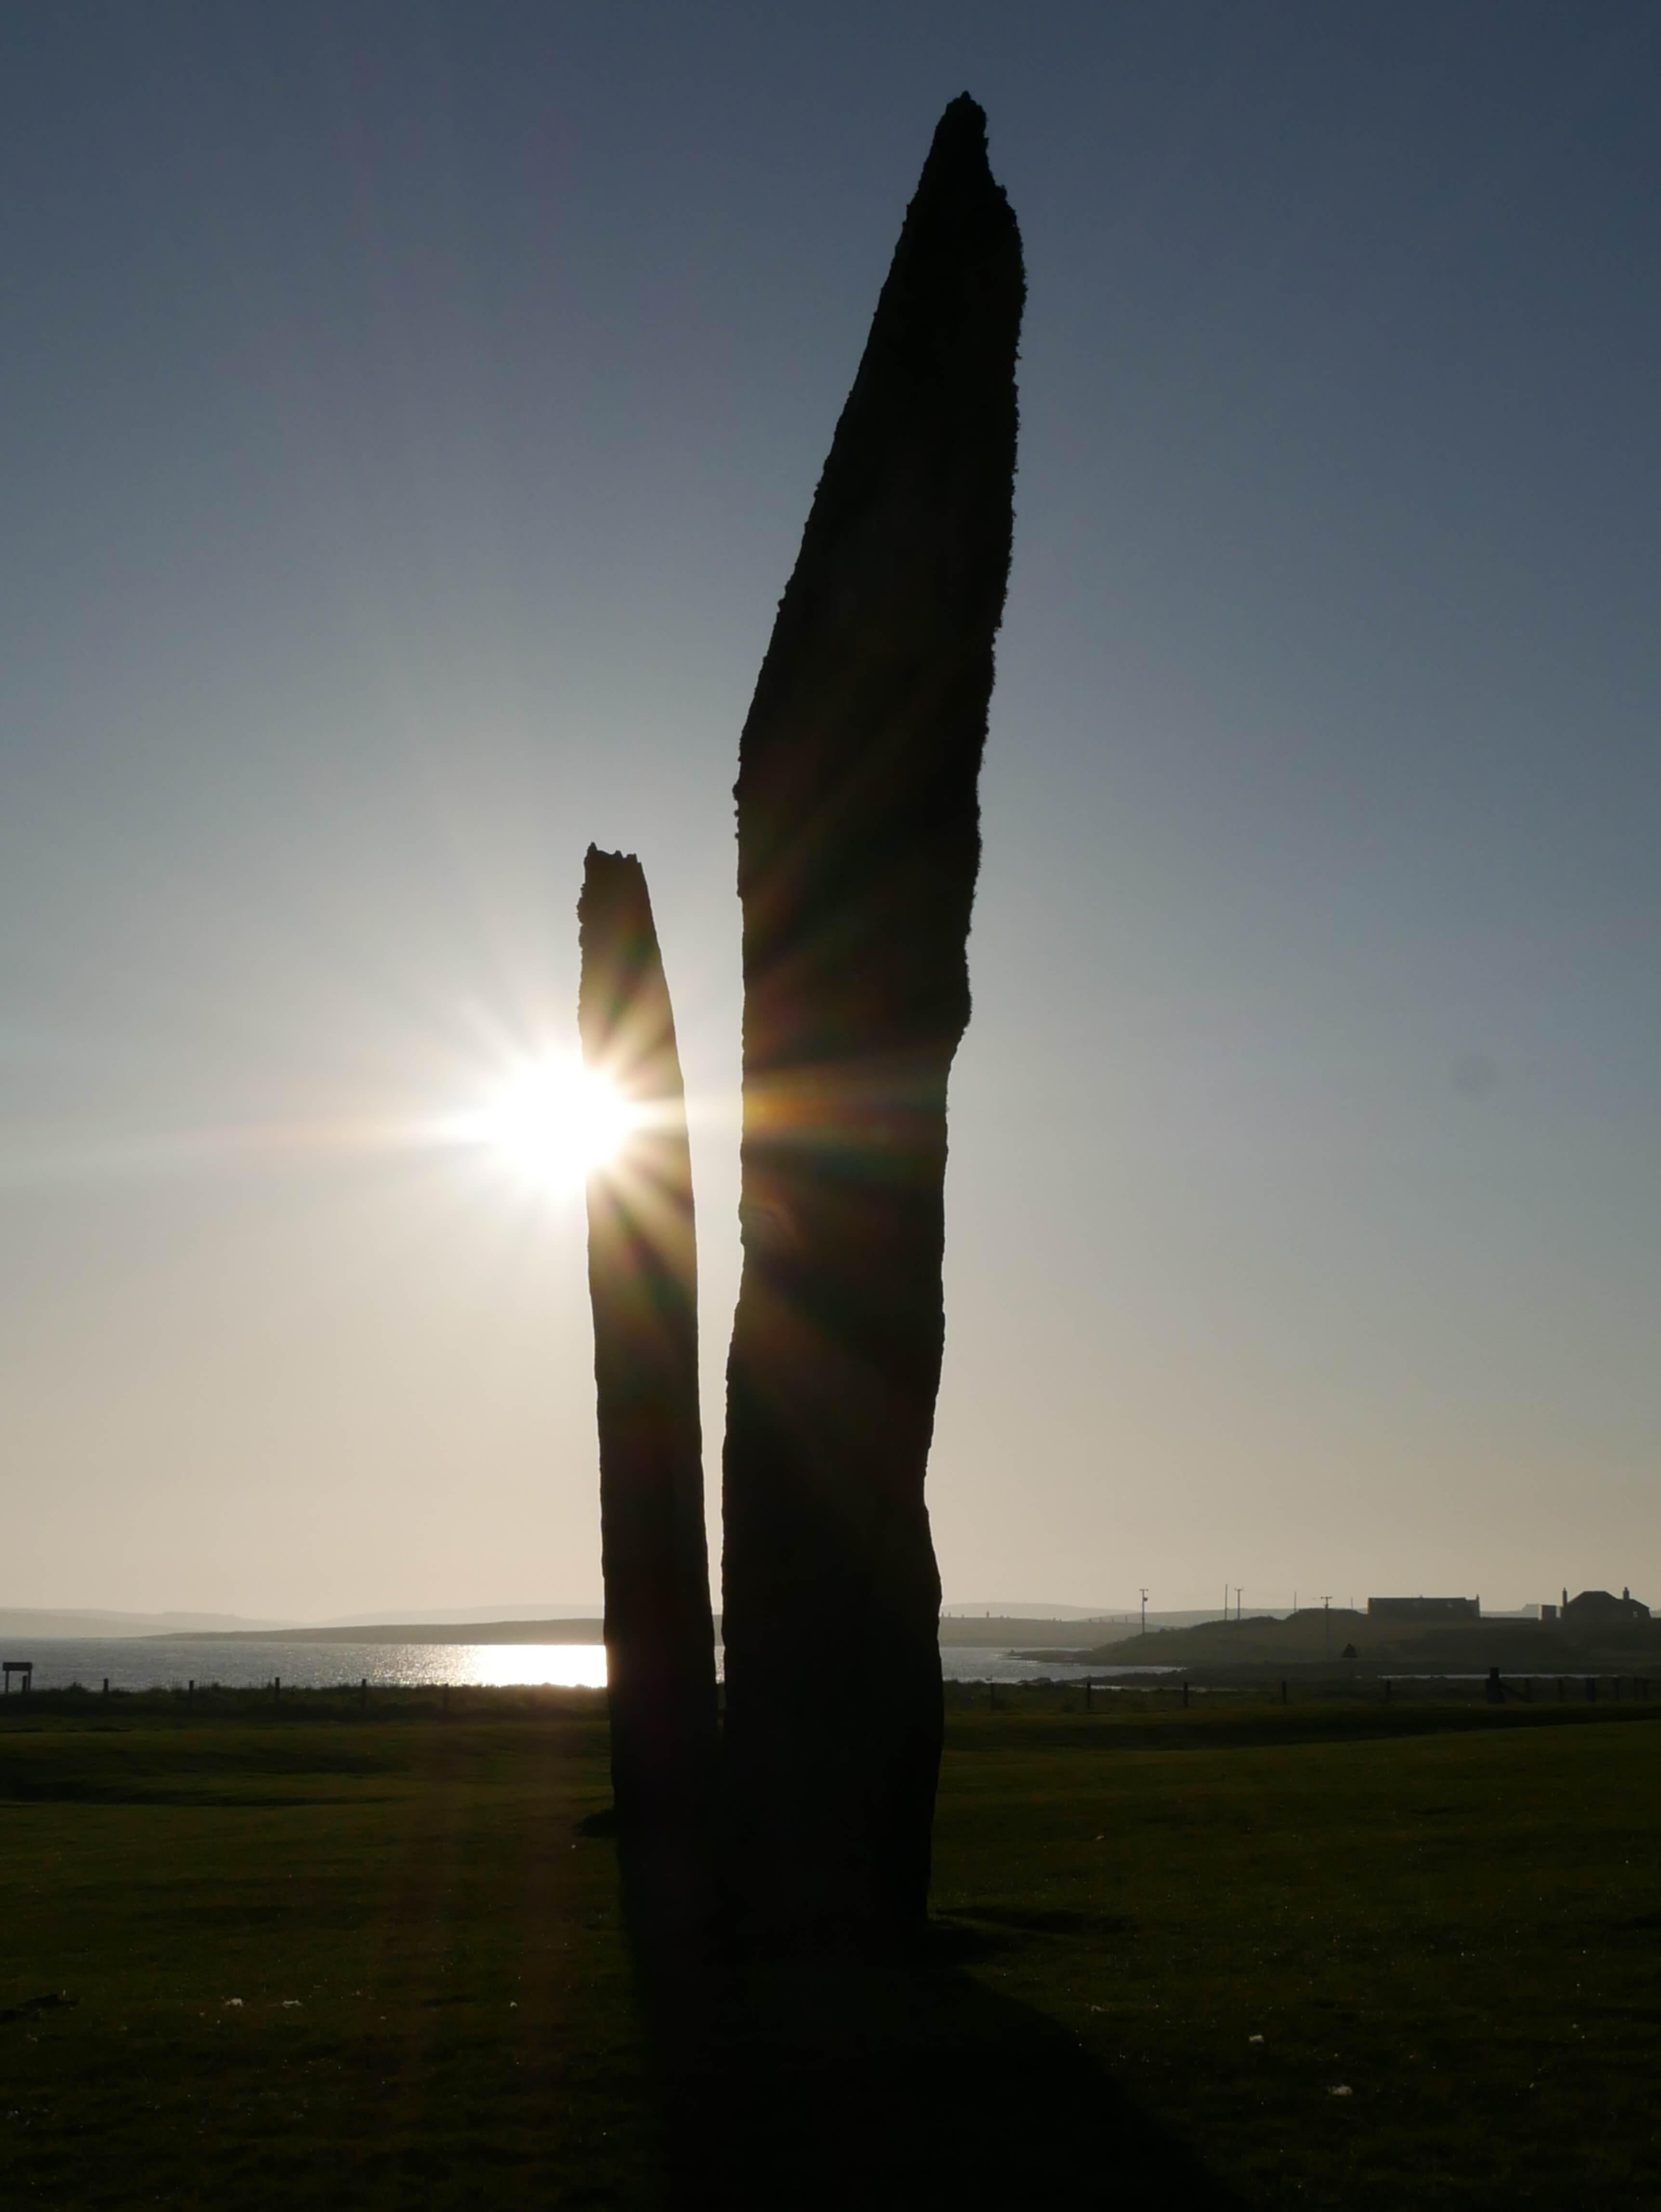 Stones of Stenness, Orkney Islands, Scotland - Orkneyology.com